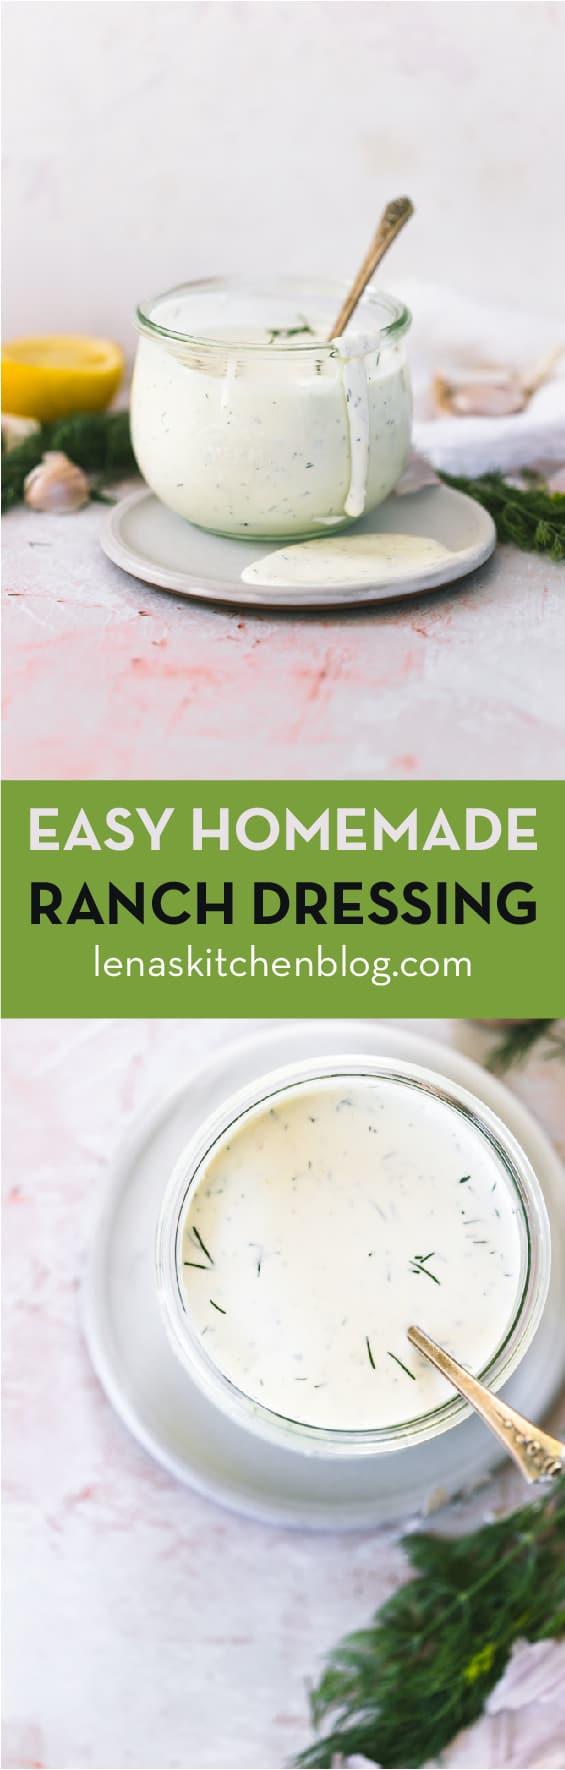 EASY HOMEMADE RANCH DRESSING by lenaskitchenblog.com